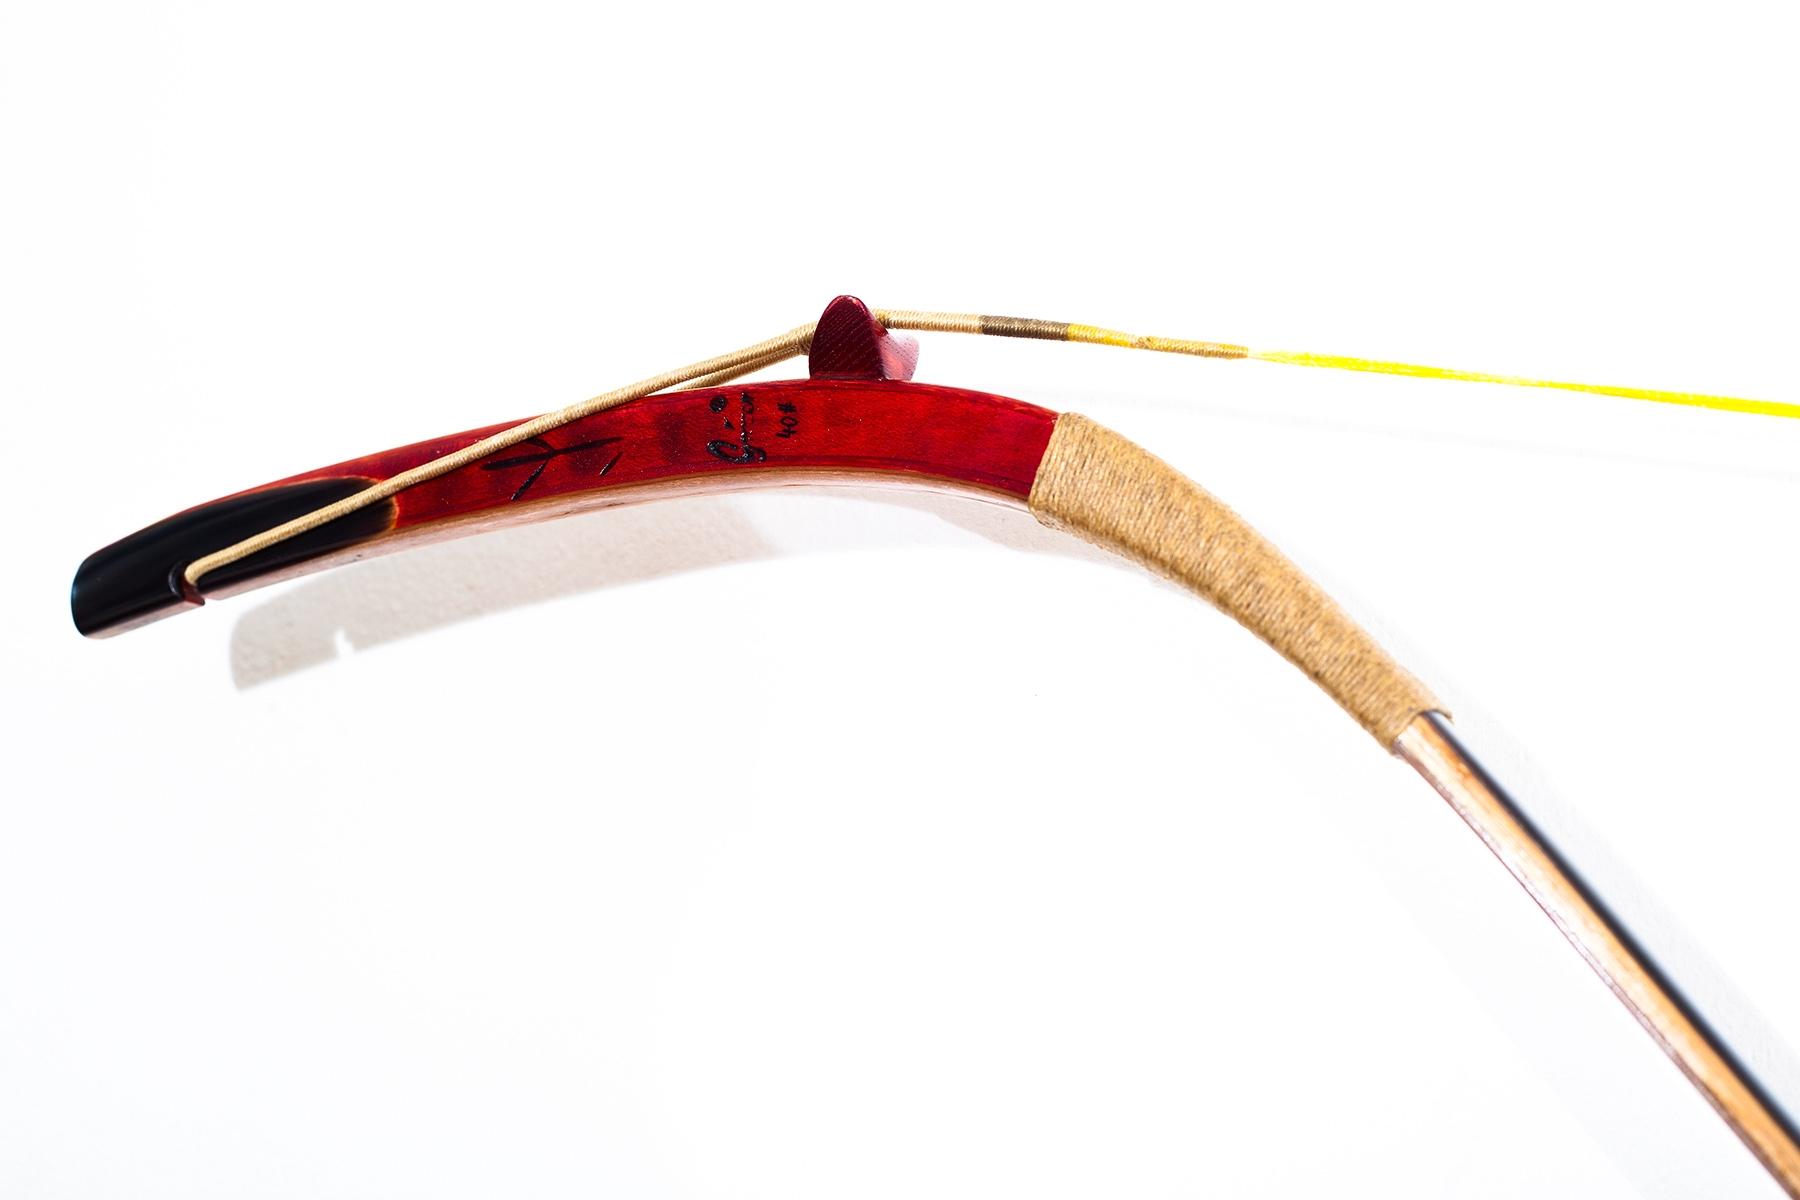 Manchurian recurve bow